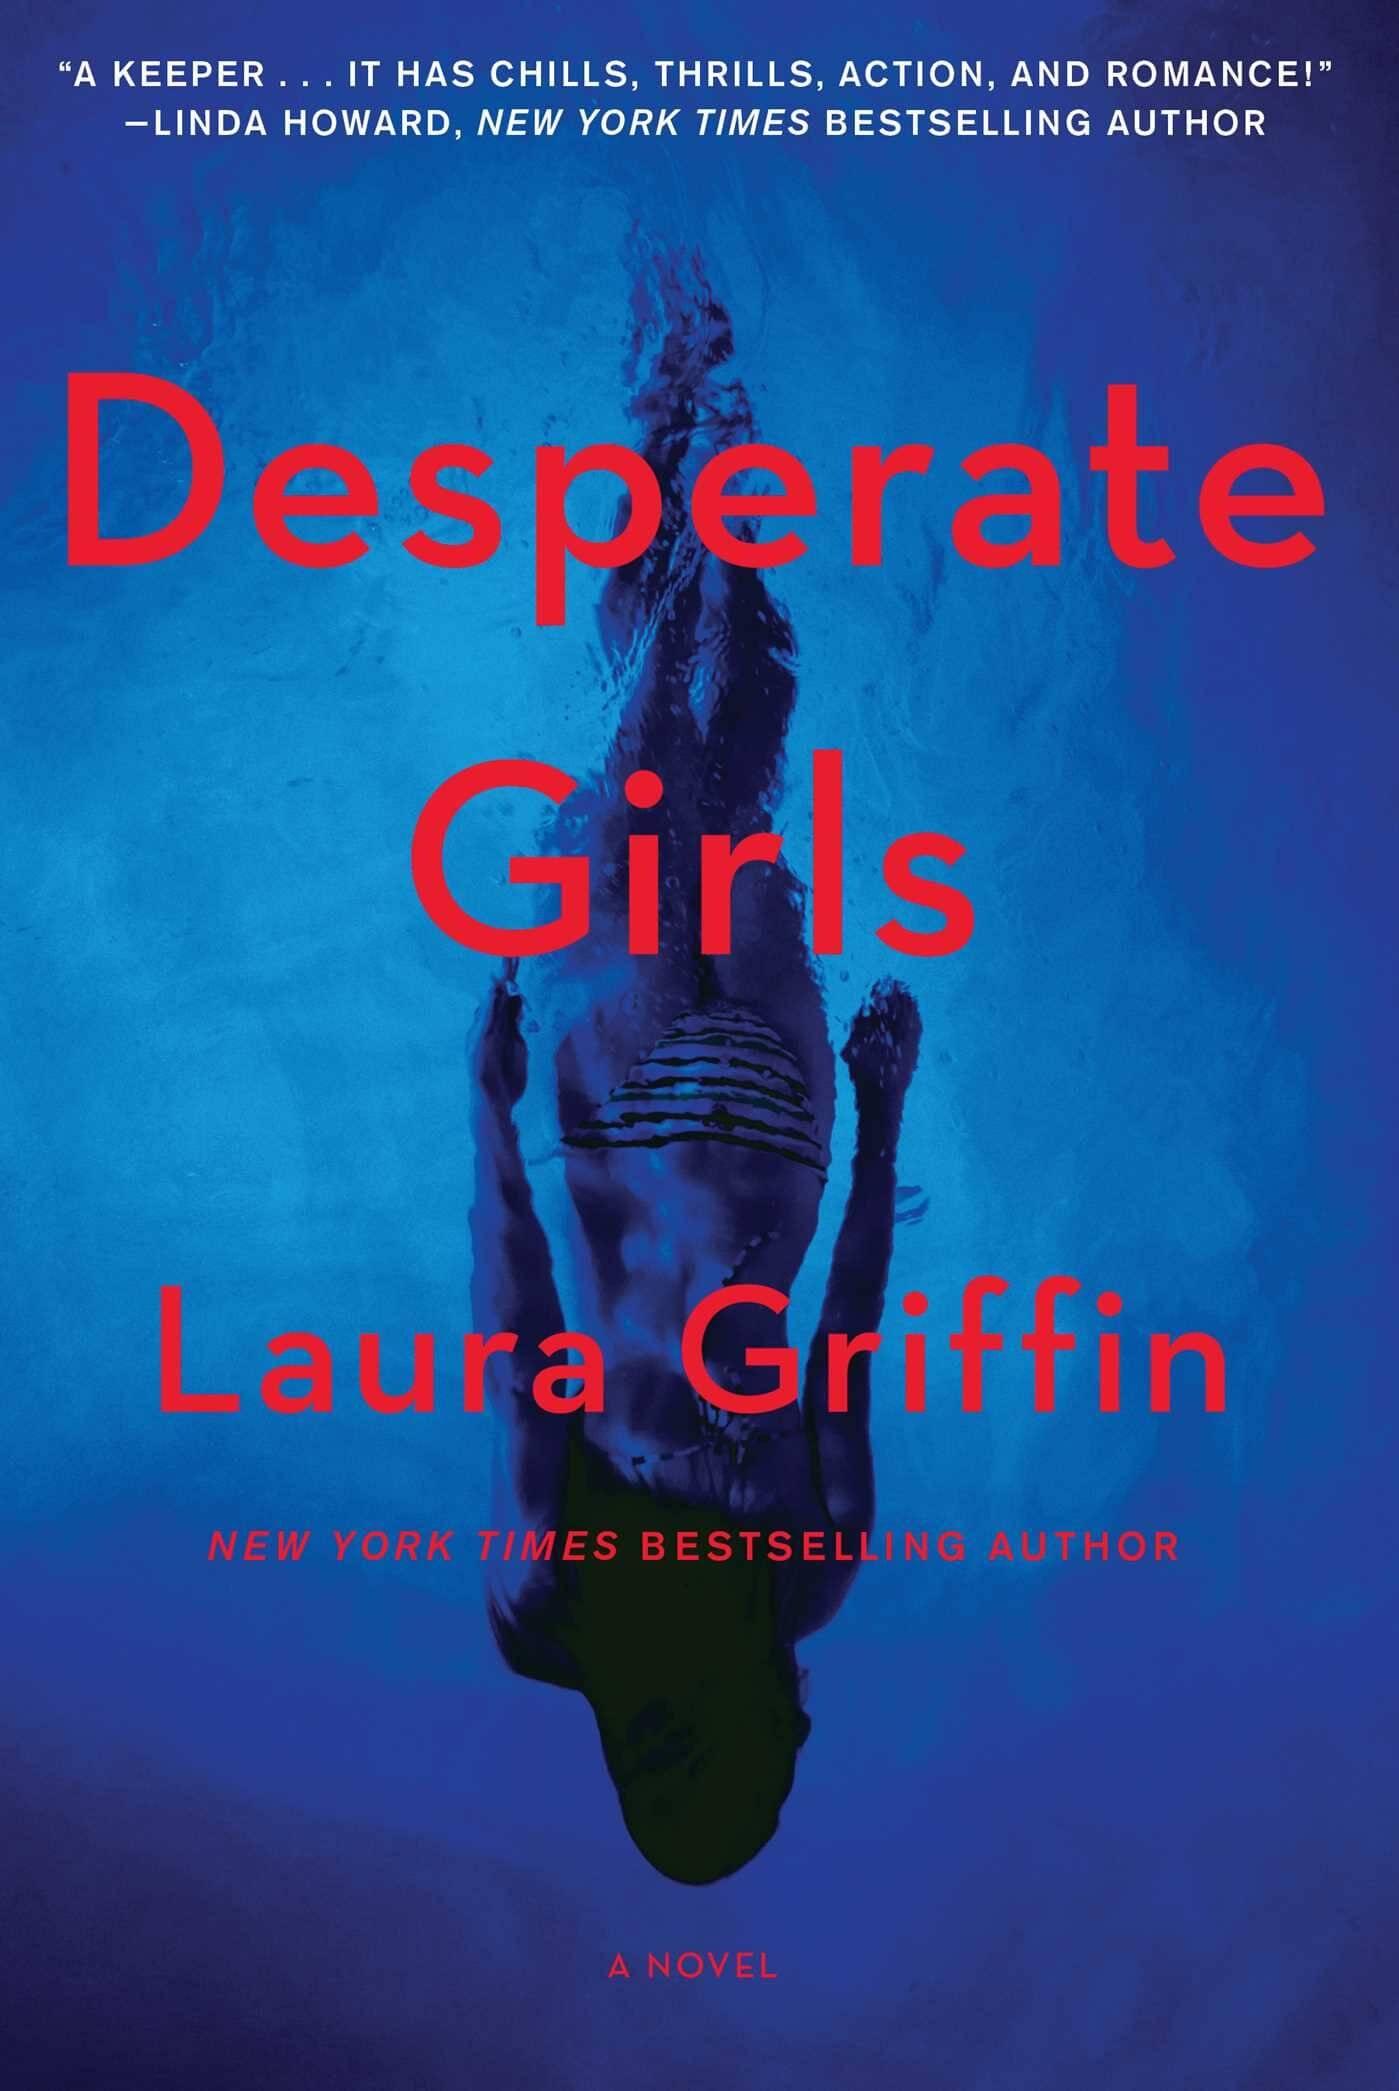 Desperate Girls by Laura Griffin